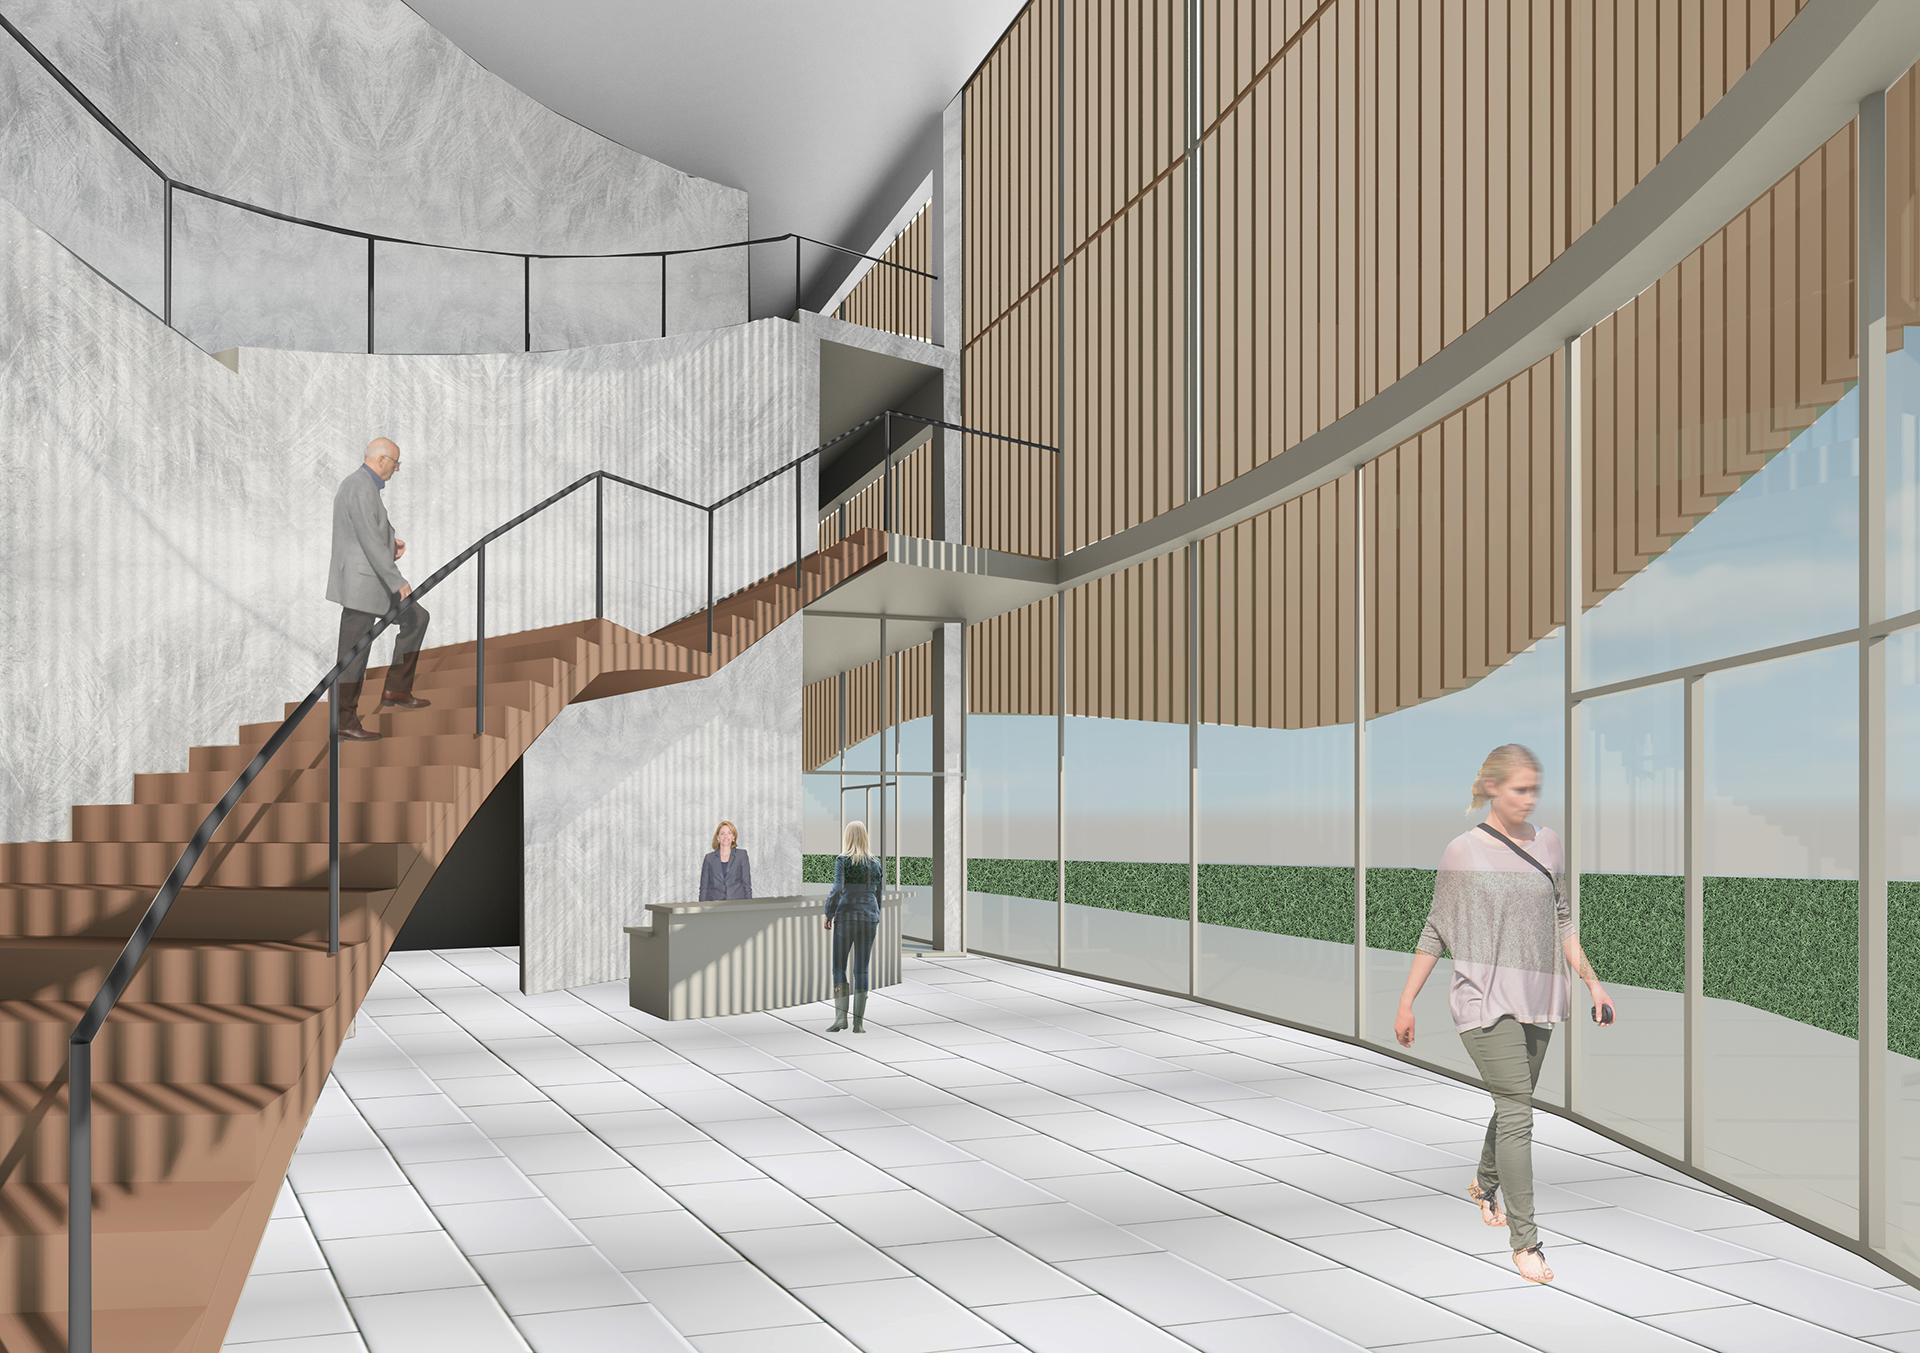 Interior View Of A Telephone Museum Design Concept By Rachel Jensen, A  Junior Architectural Studies Major.